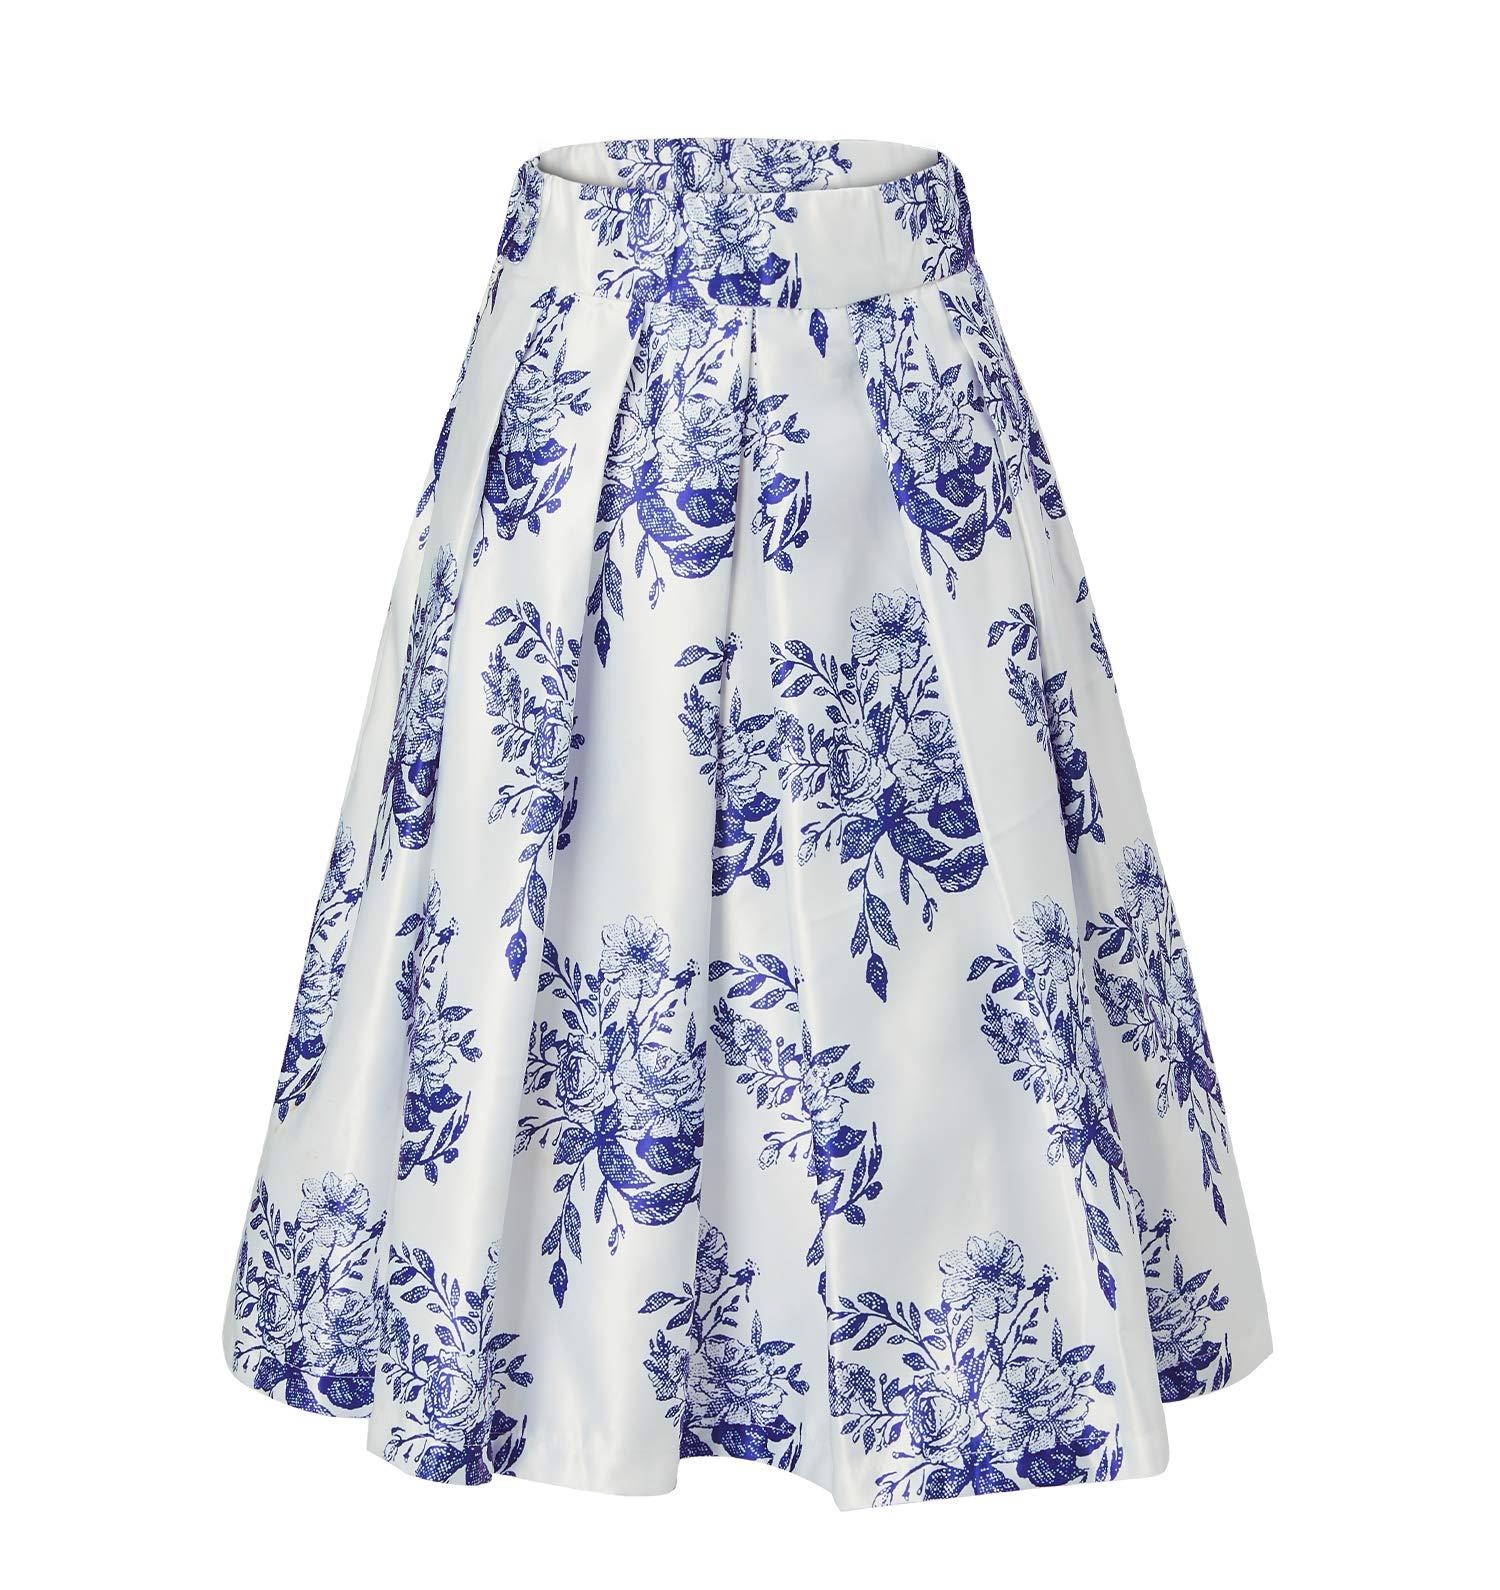 Alistyle Women Midi Dress Porcelain Print High Waist Pleated Swing A-Line Flared Skater Skirts